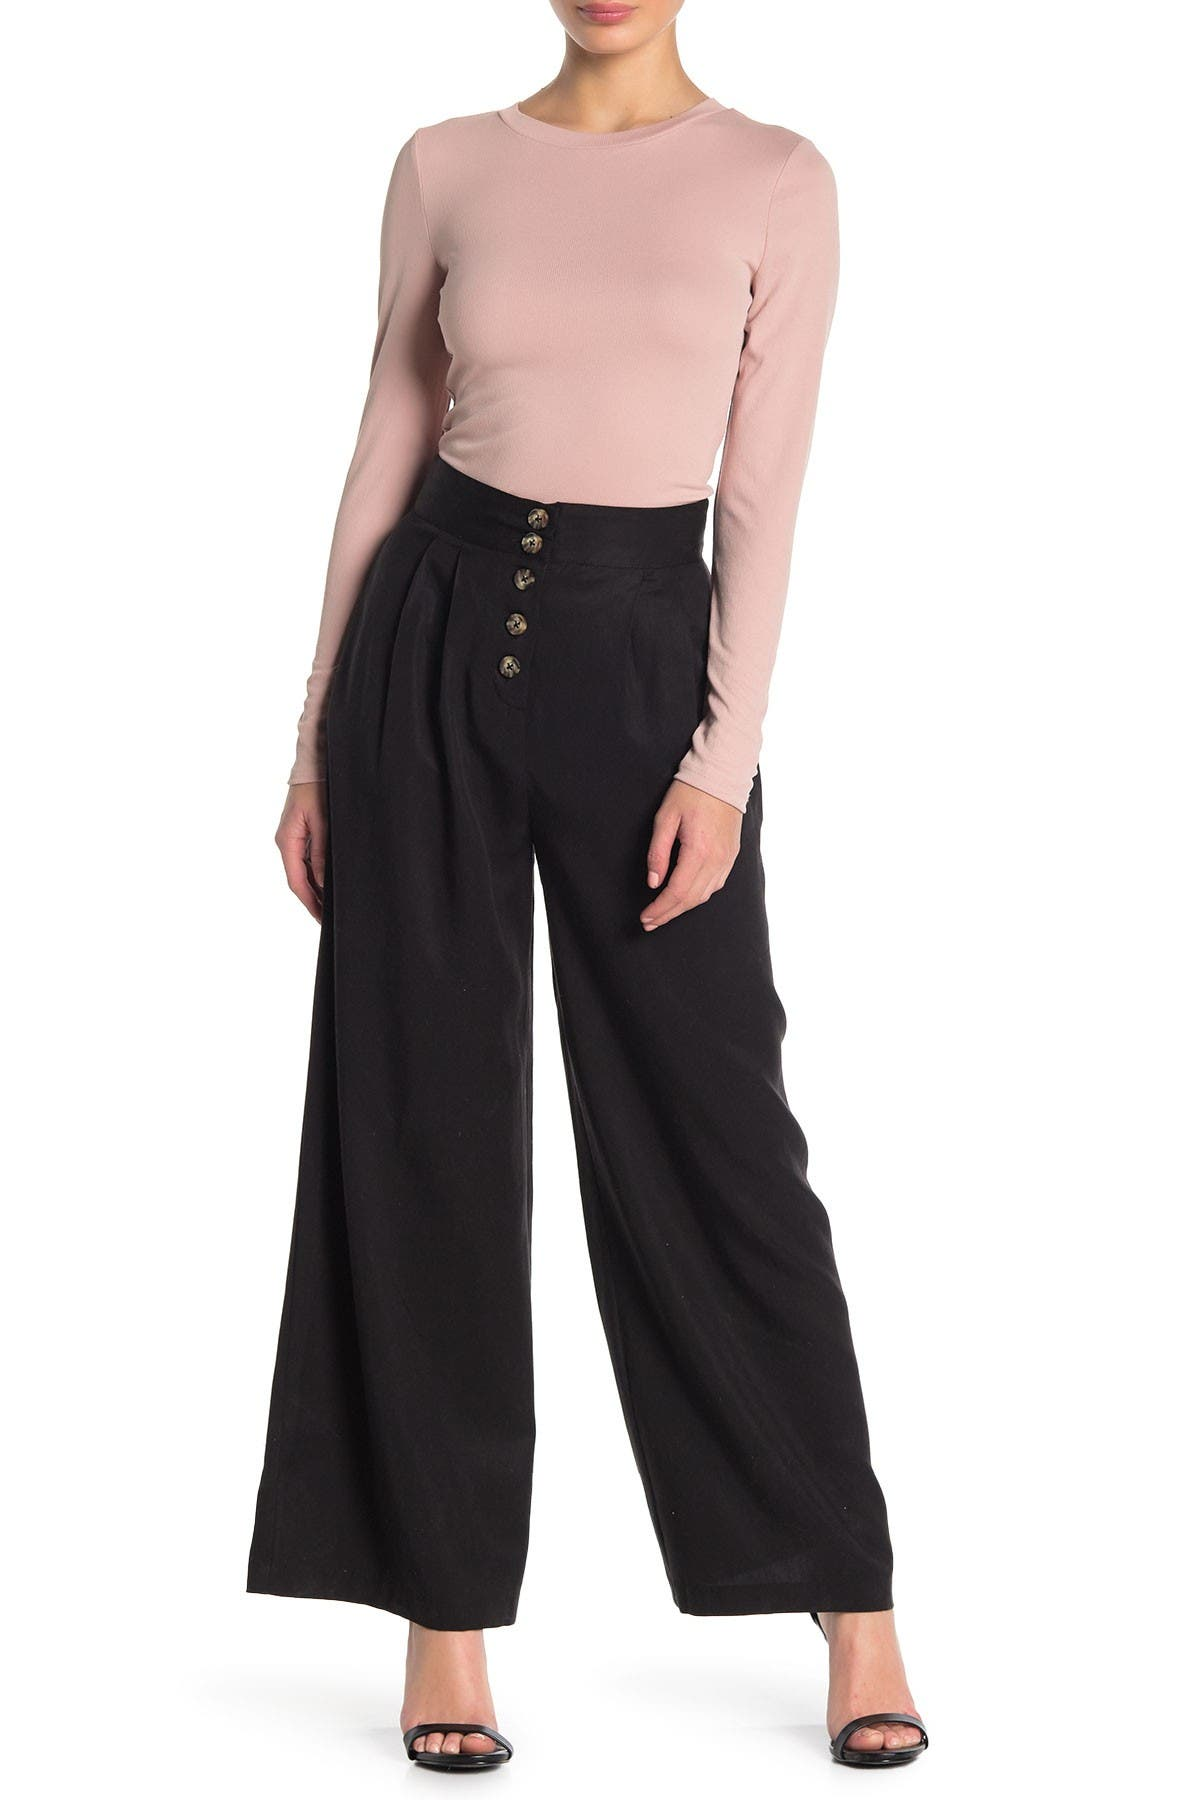 Image of Socialite Button Fly High Waist Wide Leg Pants